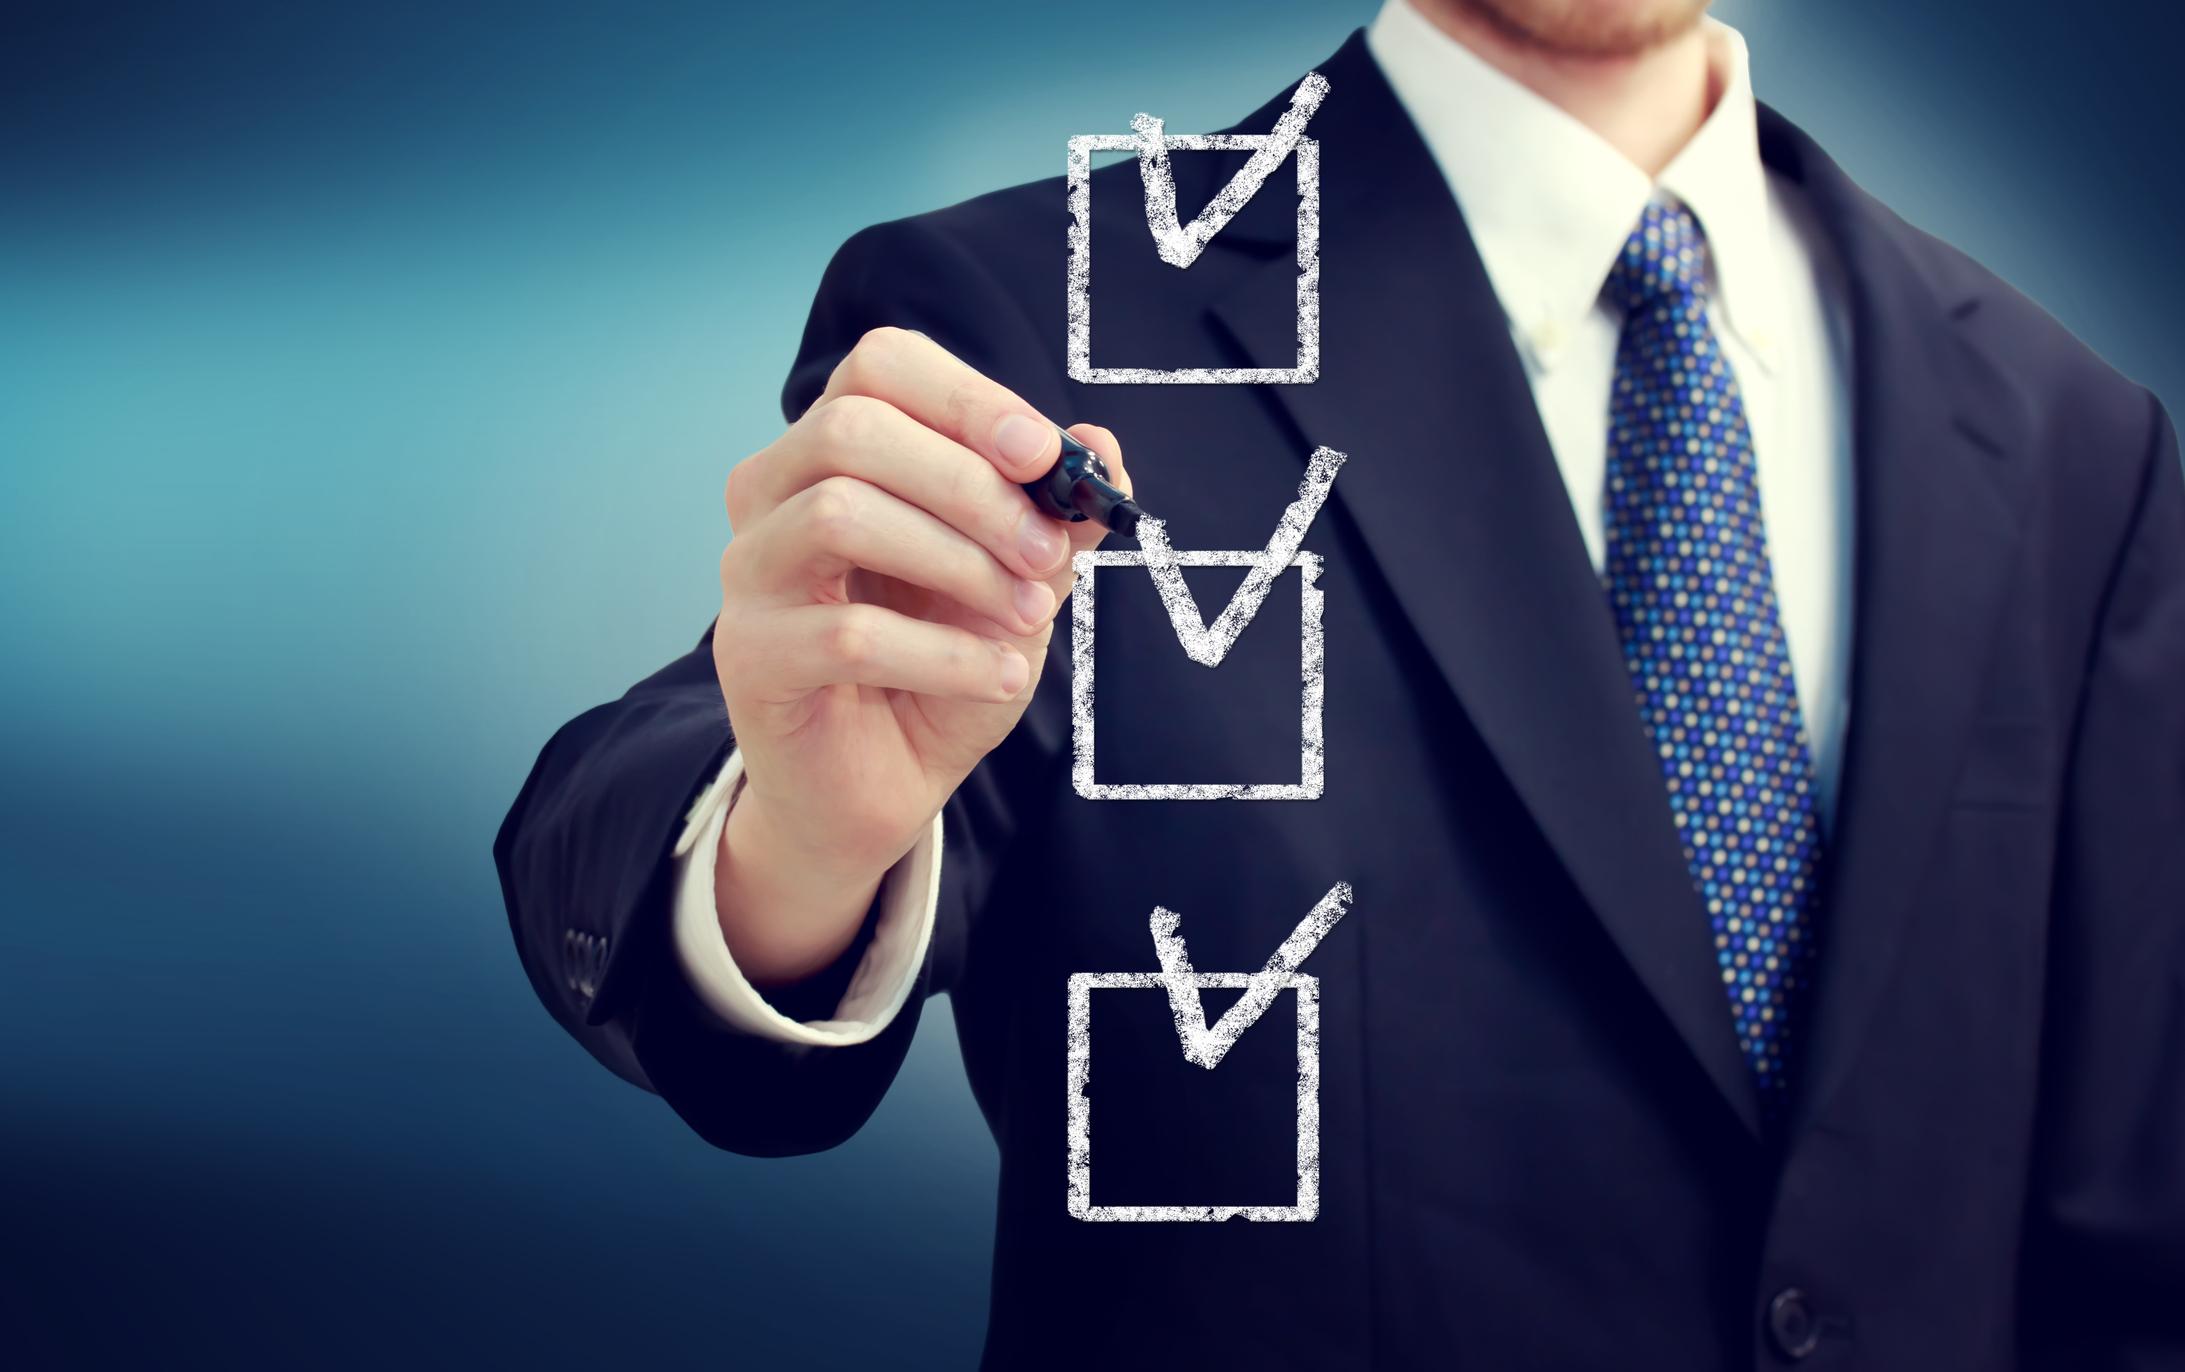 A businessman ticks off boxes on a checklist.